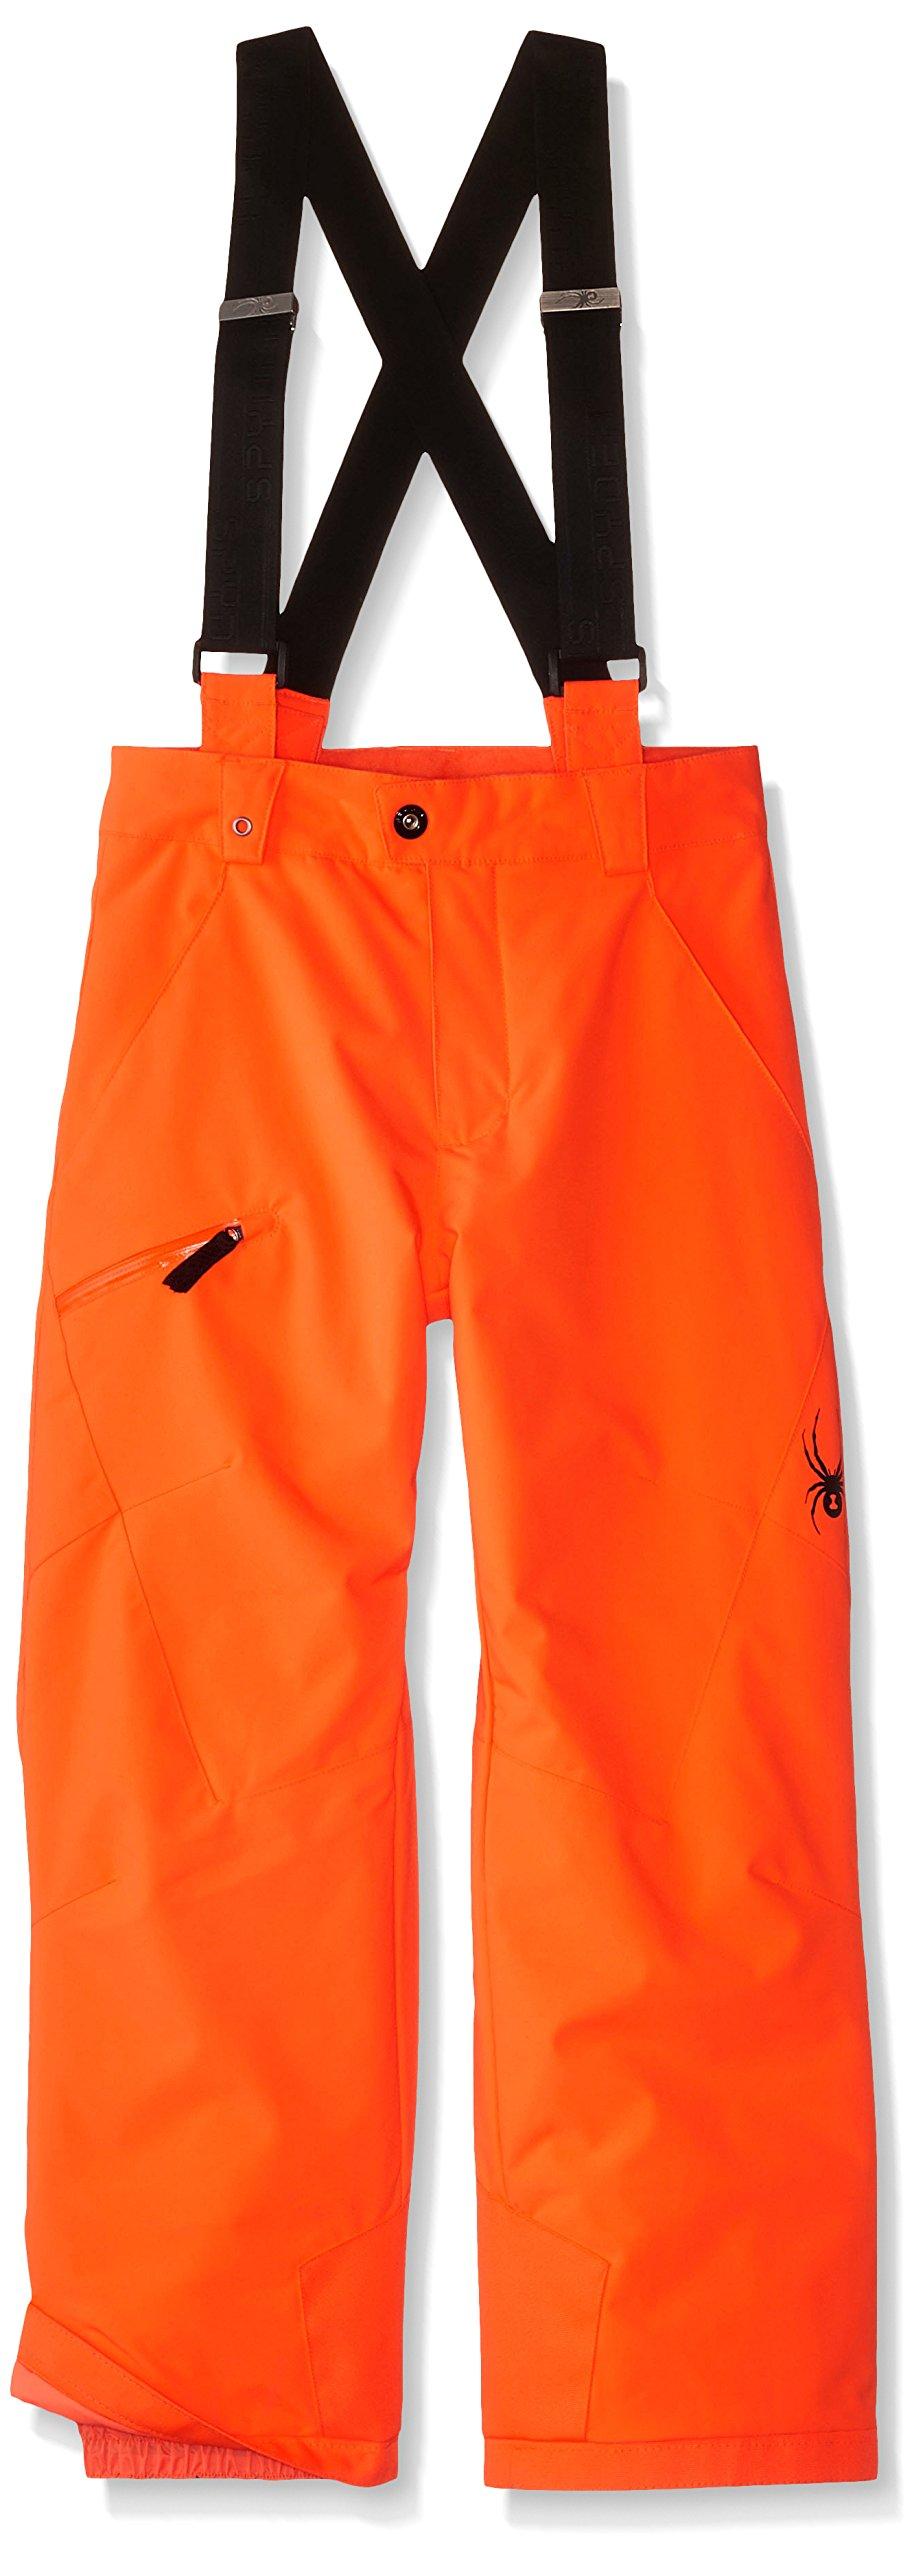 Spyder Boys Propulsion Pant, 20, Bryte Orange